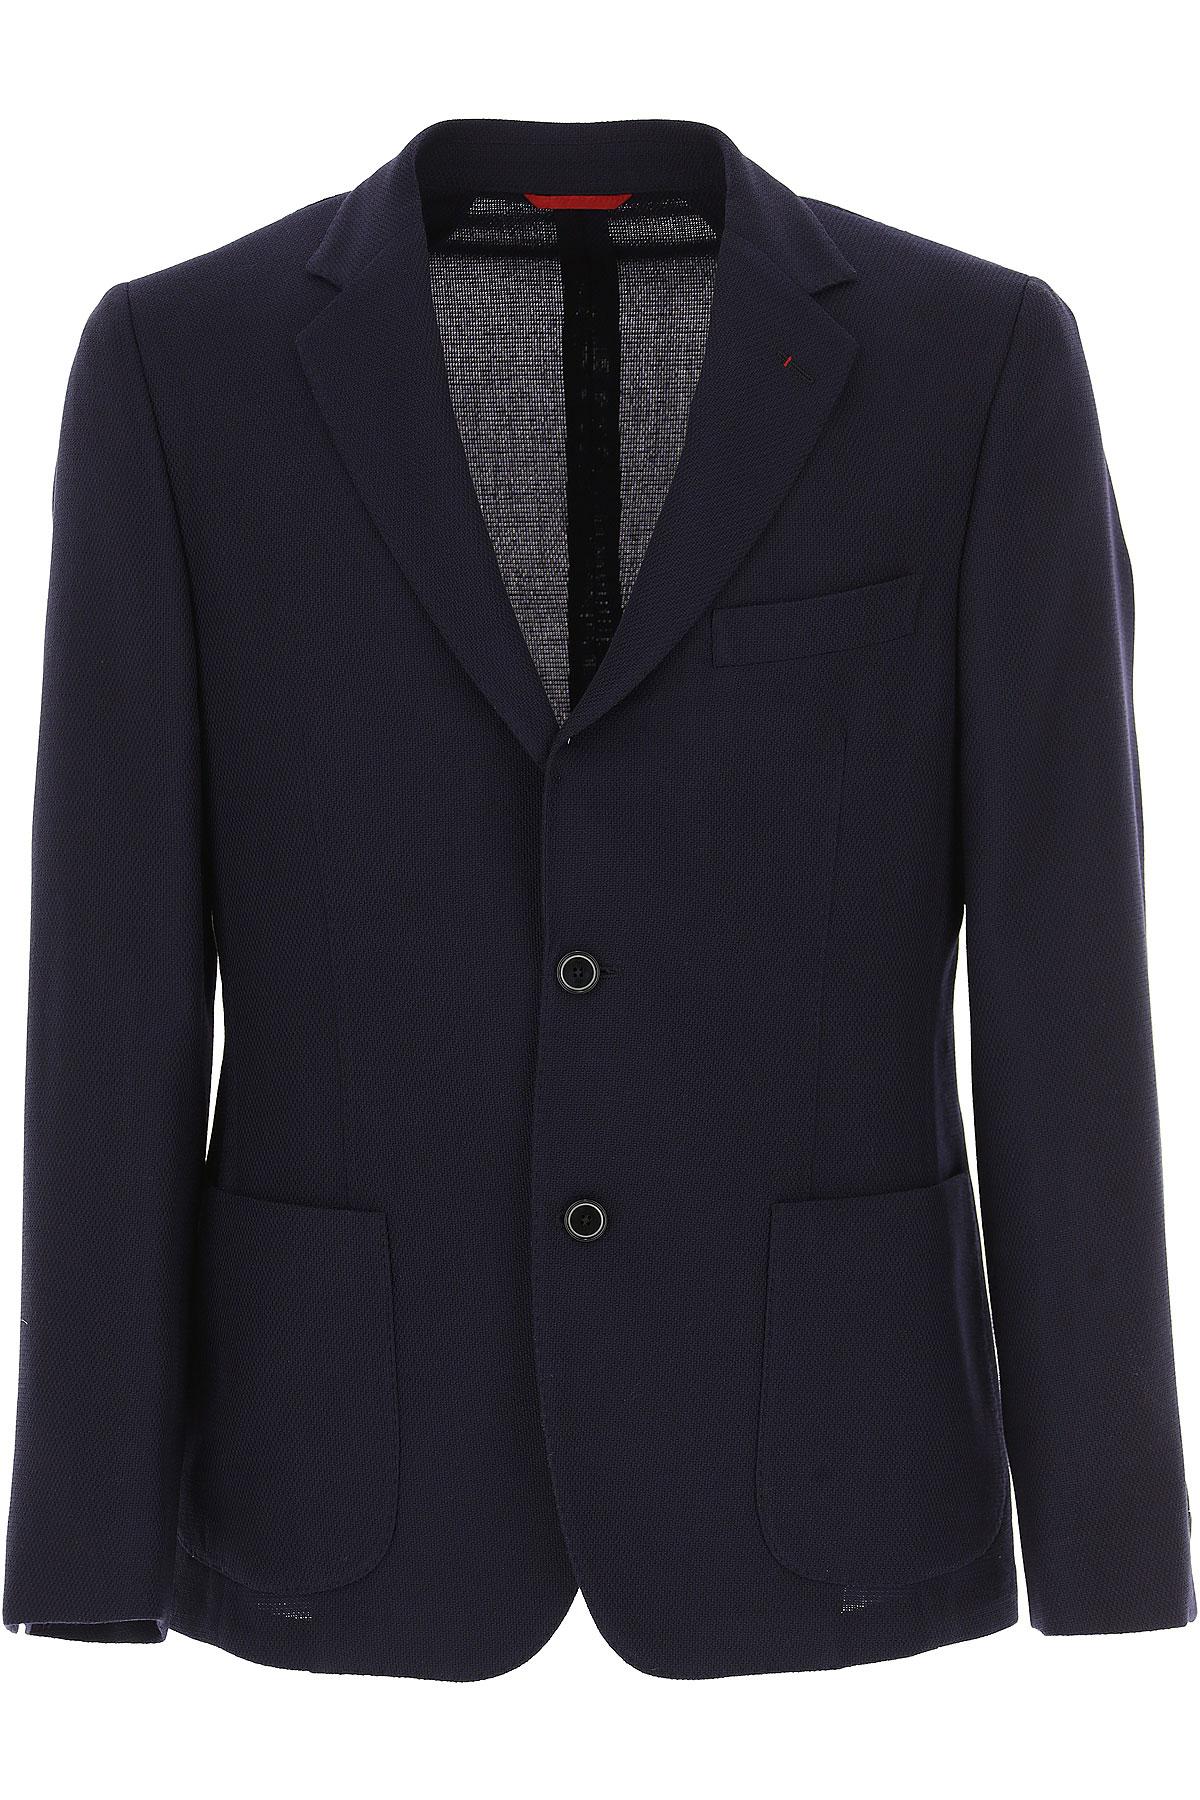 Image of Fay Blazer for Men, Sport Coat On Sale, navy, Virgin wool, 2017, L M XL